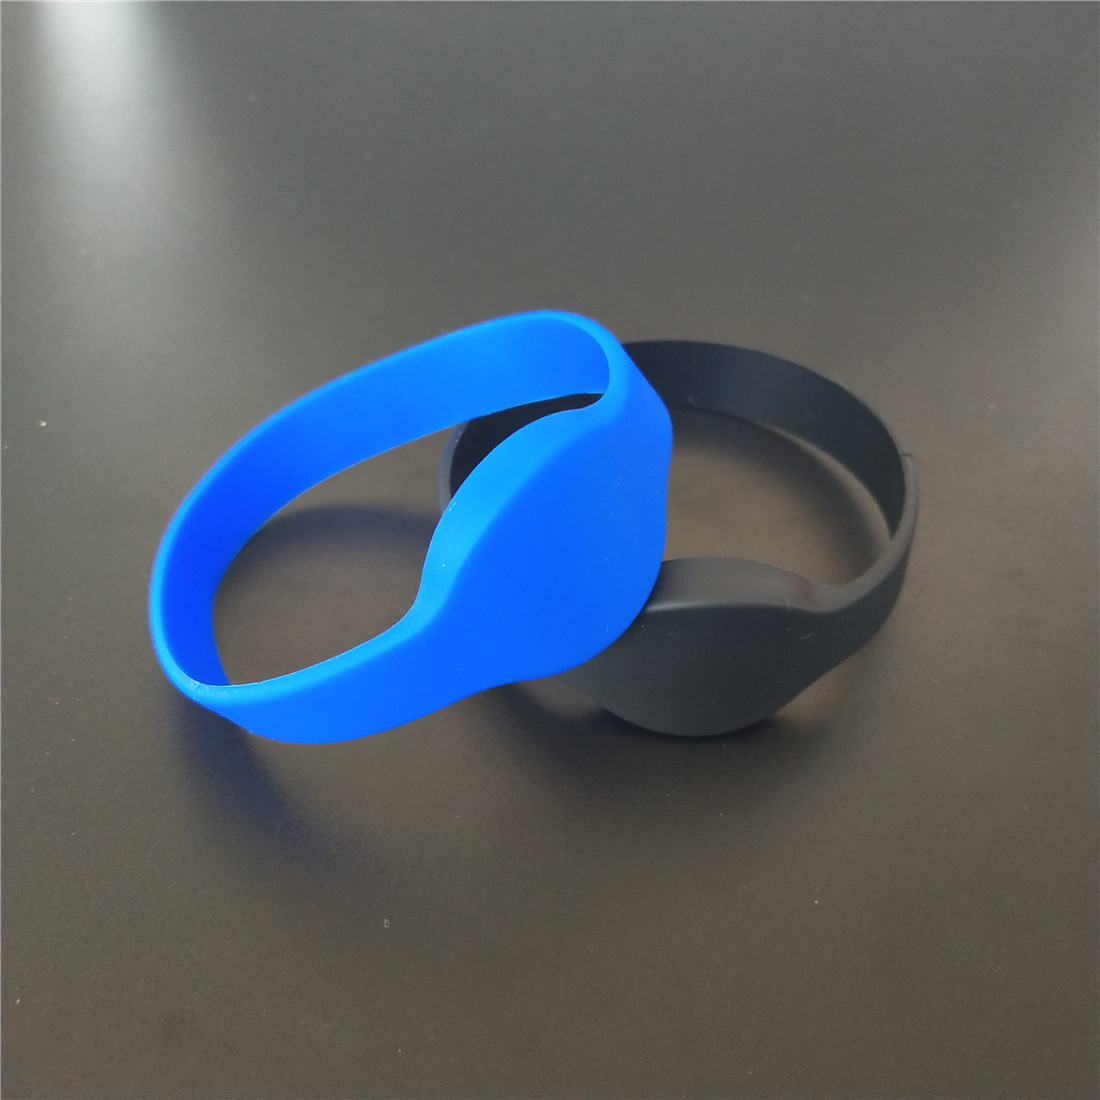 RFID Wristband 125KHz EM4100 ID Waterproof Bracelet Tag Dia 65mm бензиновая мотопомпа калибр бмп 4100 30 65 вп